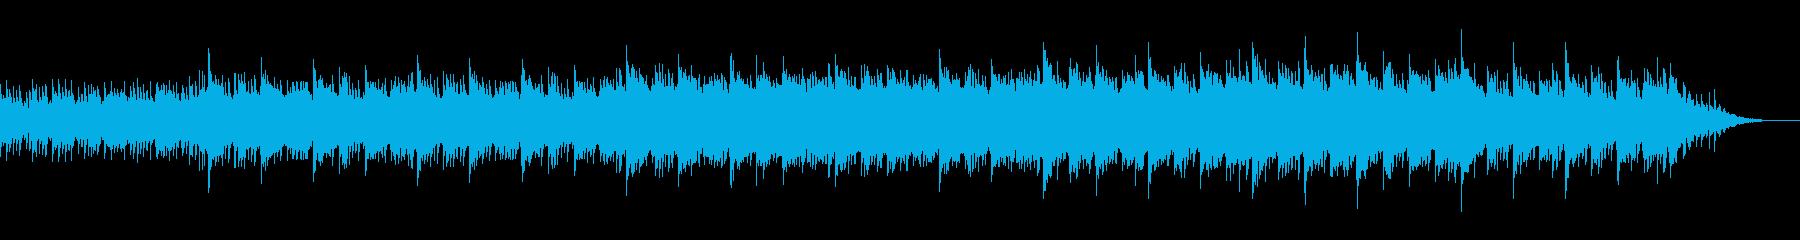 Calm CM short drum no future's reproduced waveform